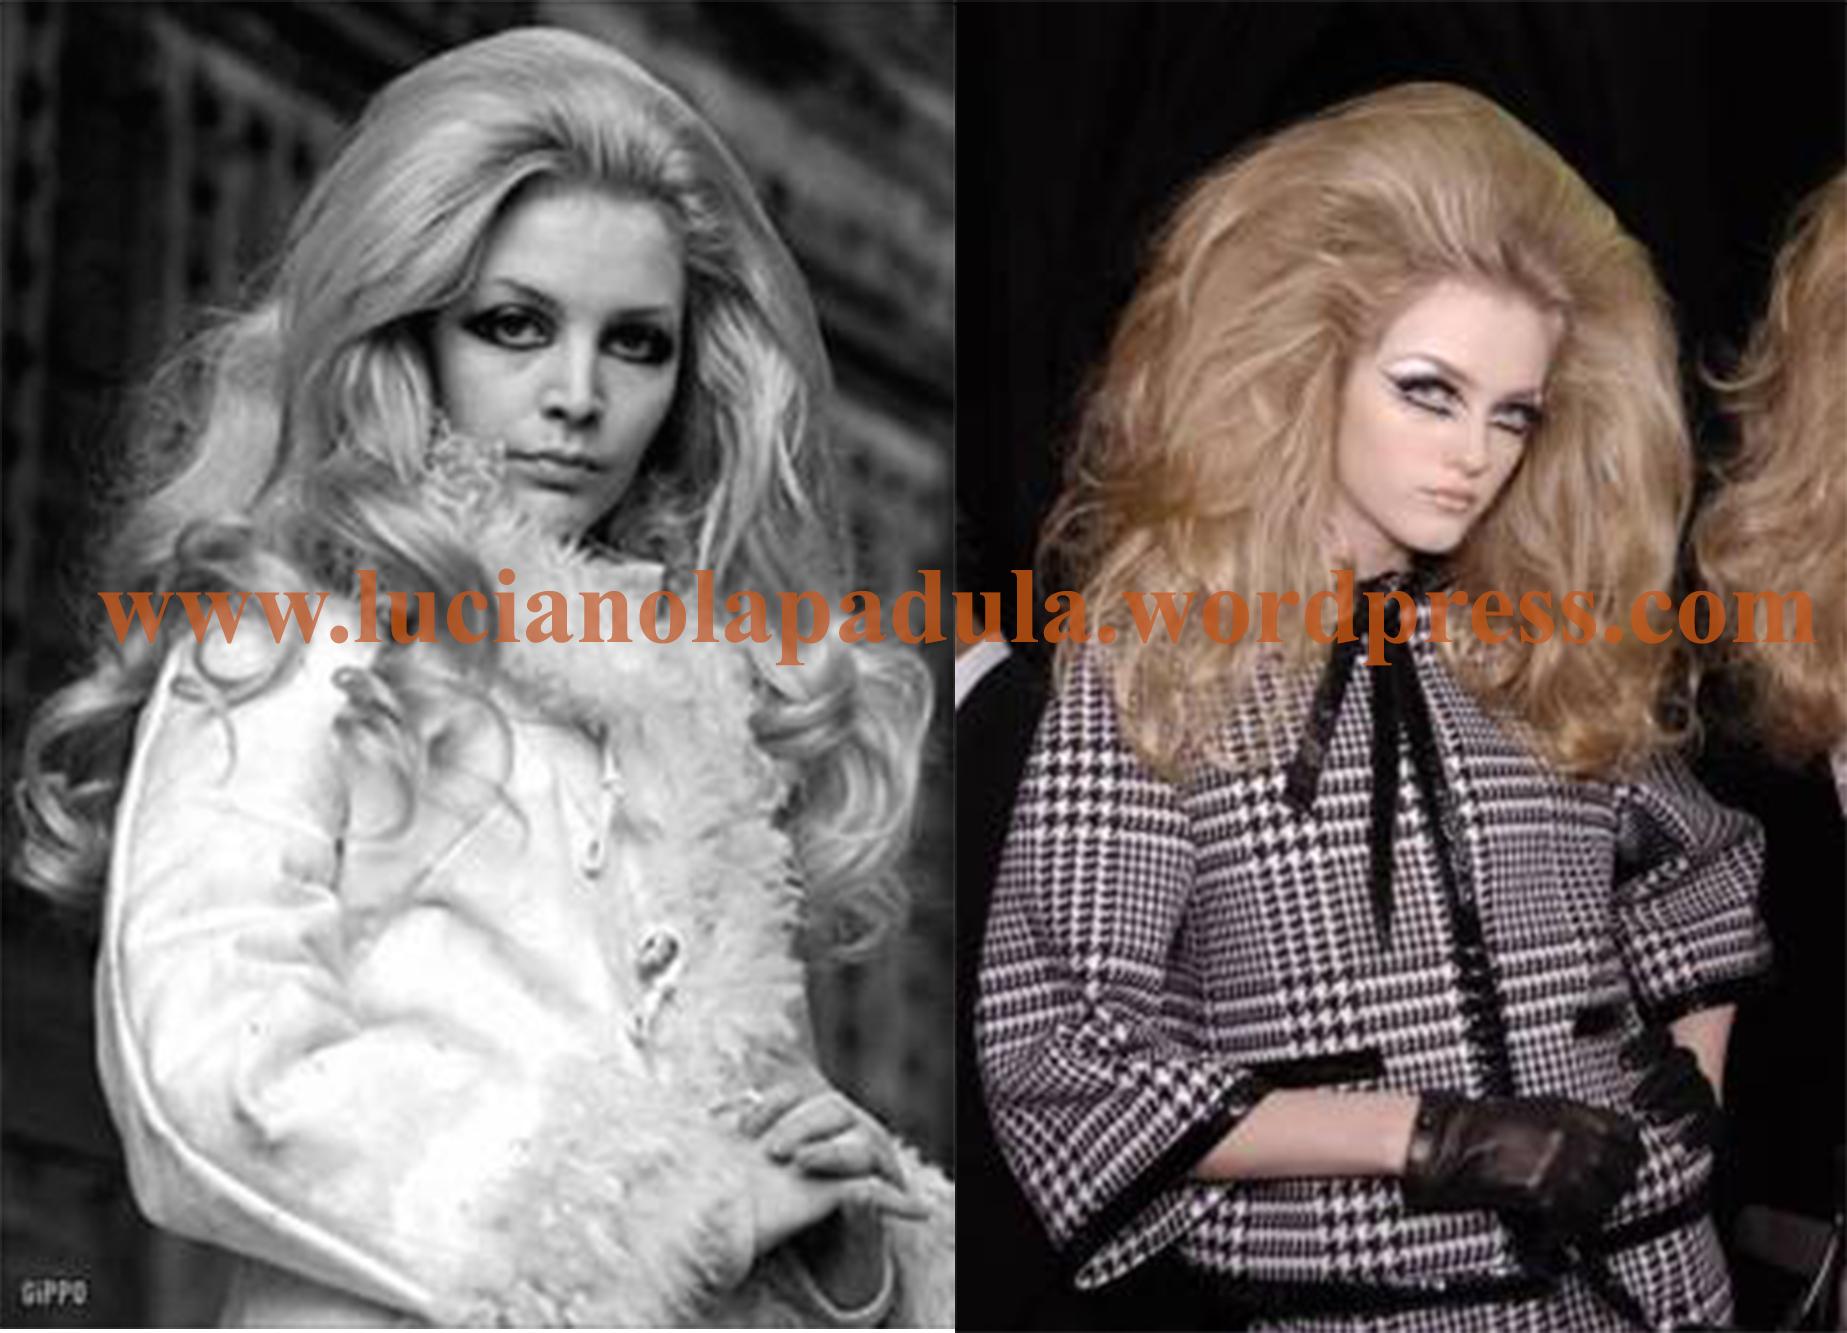 wordpress patty pravo dior hairstyle outfit moda fashion history blog blogger